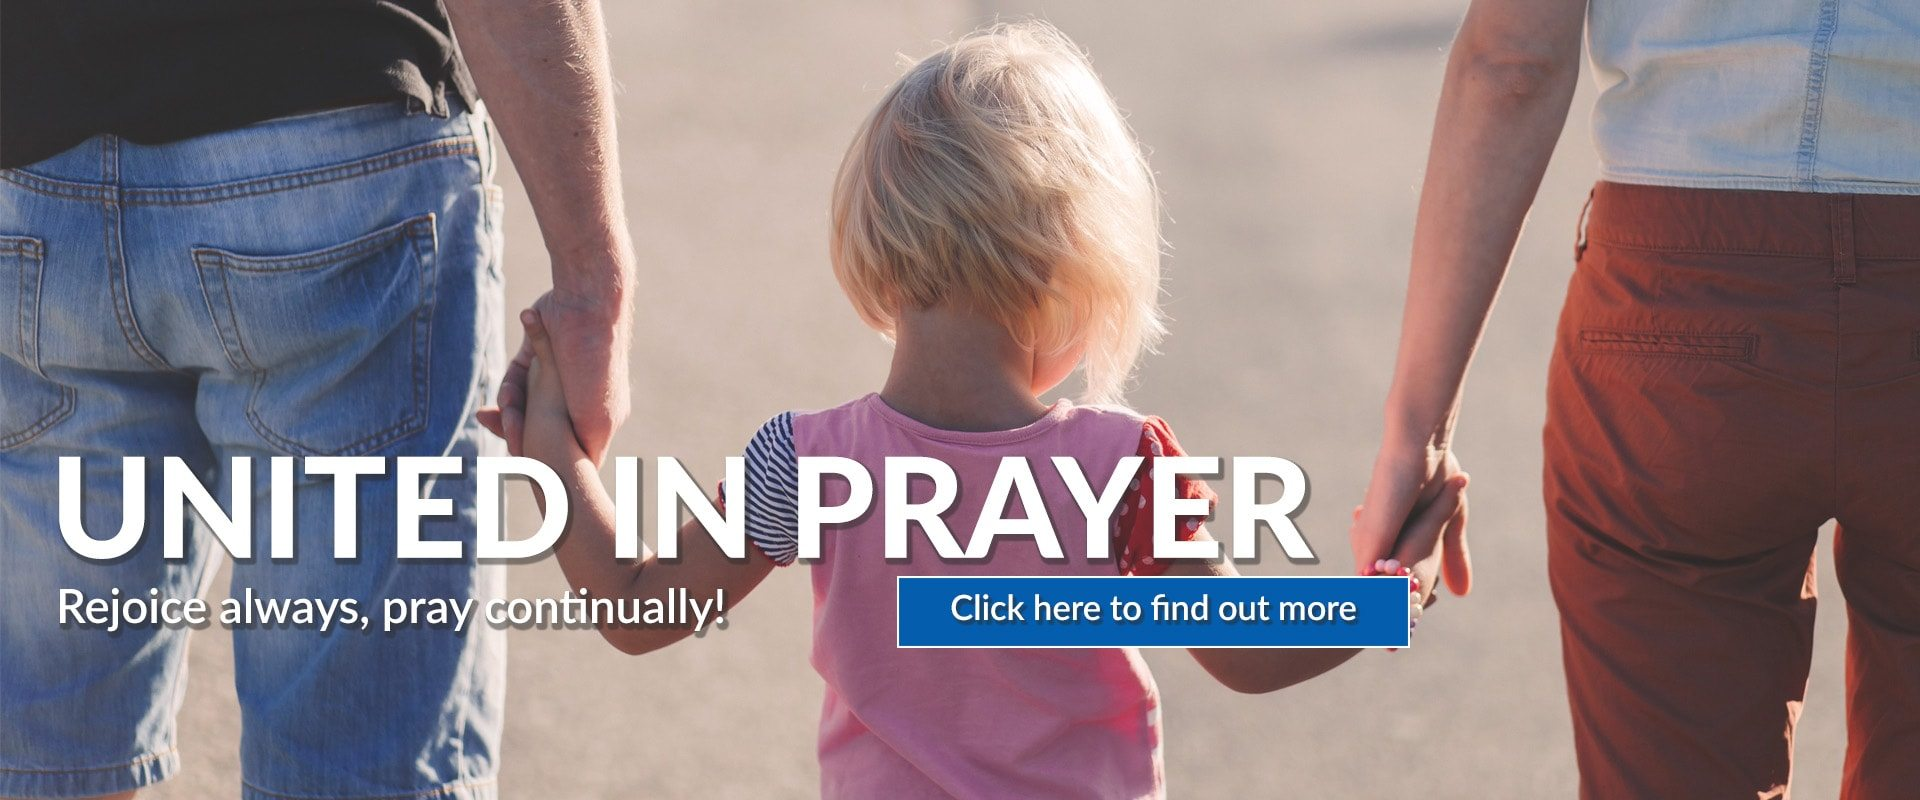 United in Prayer Web Graphic